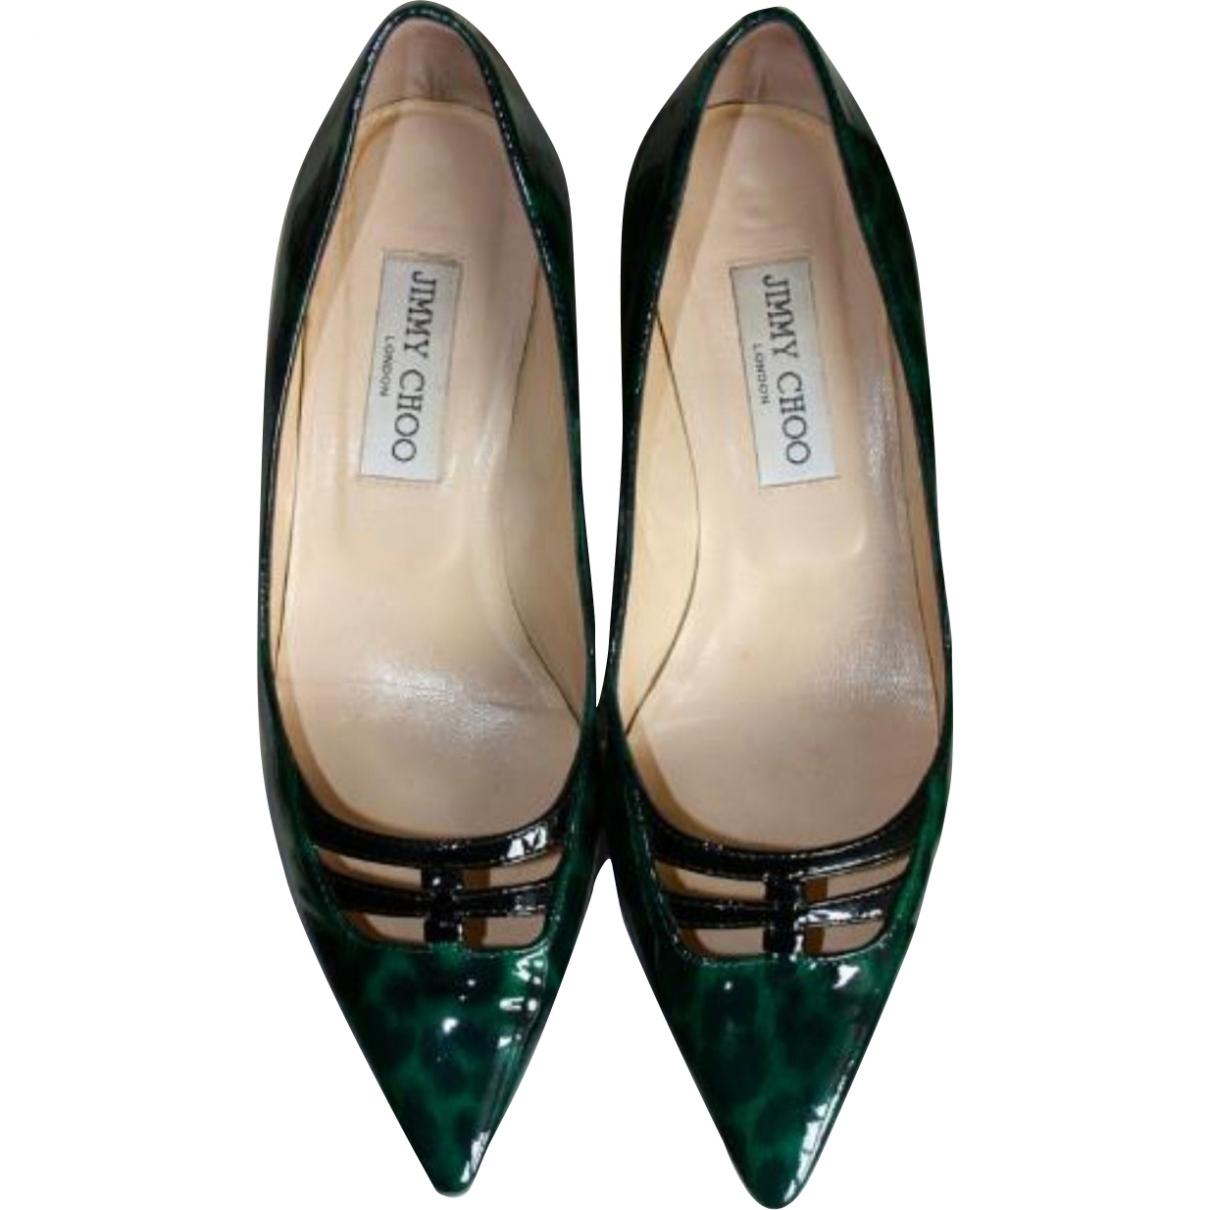 Jimmy Choo \N Patent leather Heels for Women 37 EU